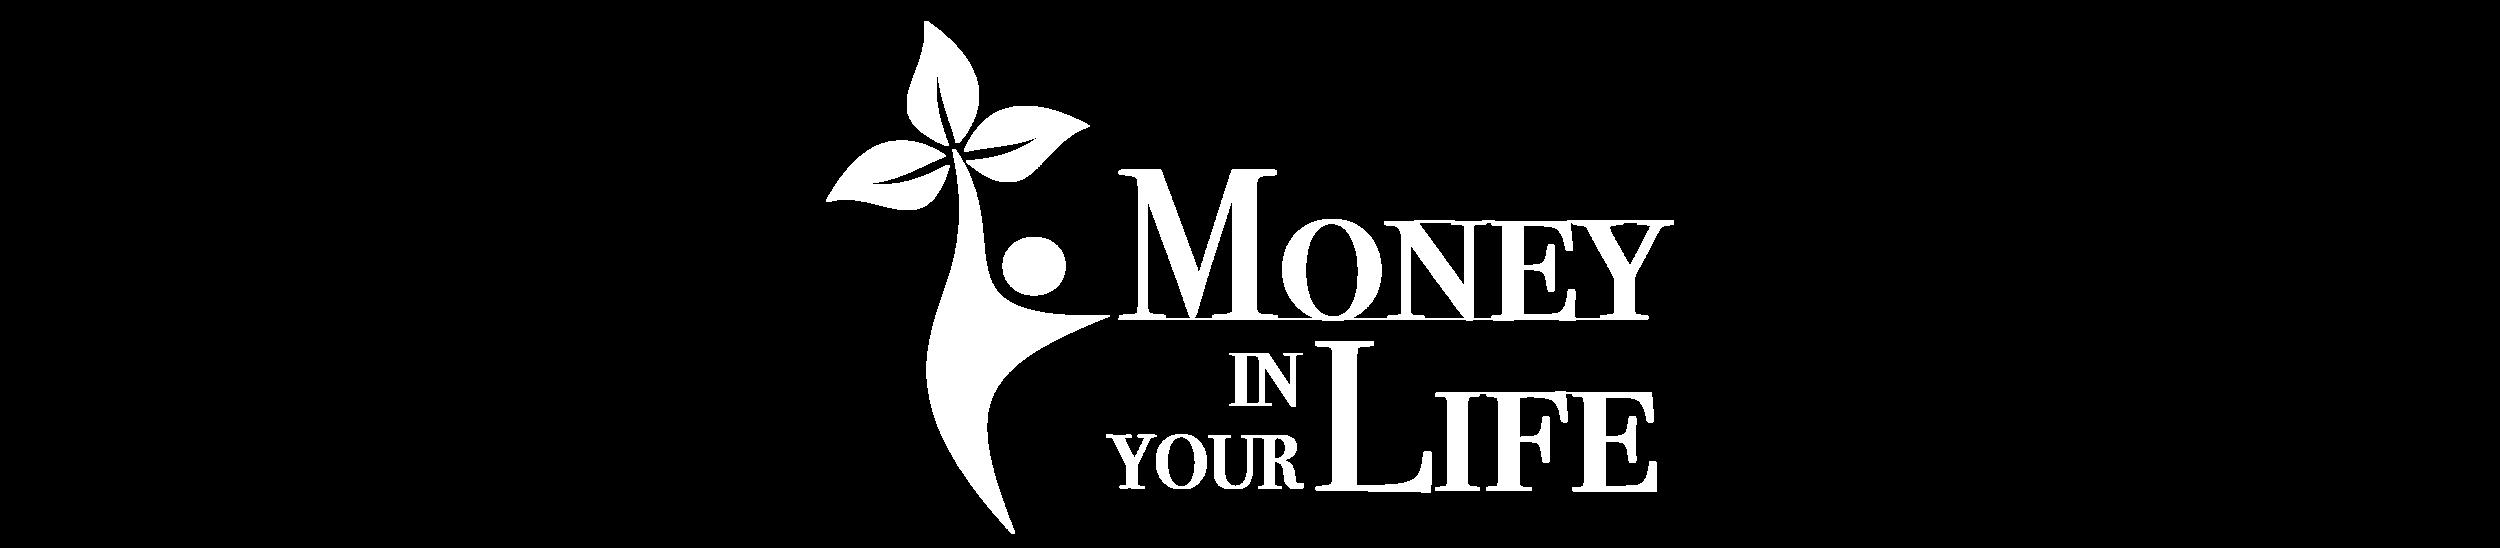 MoneyArtboa222rd 1 copy 7.png